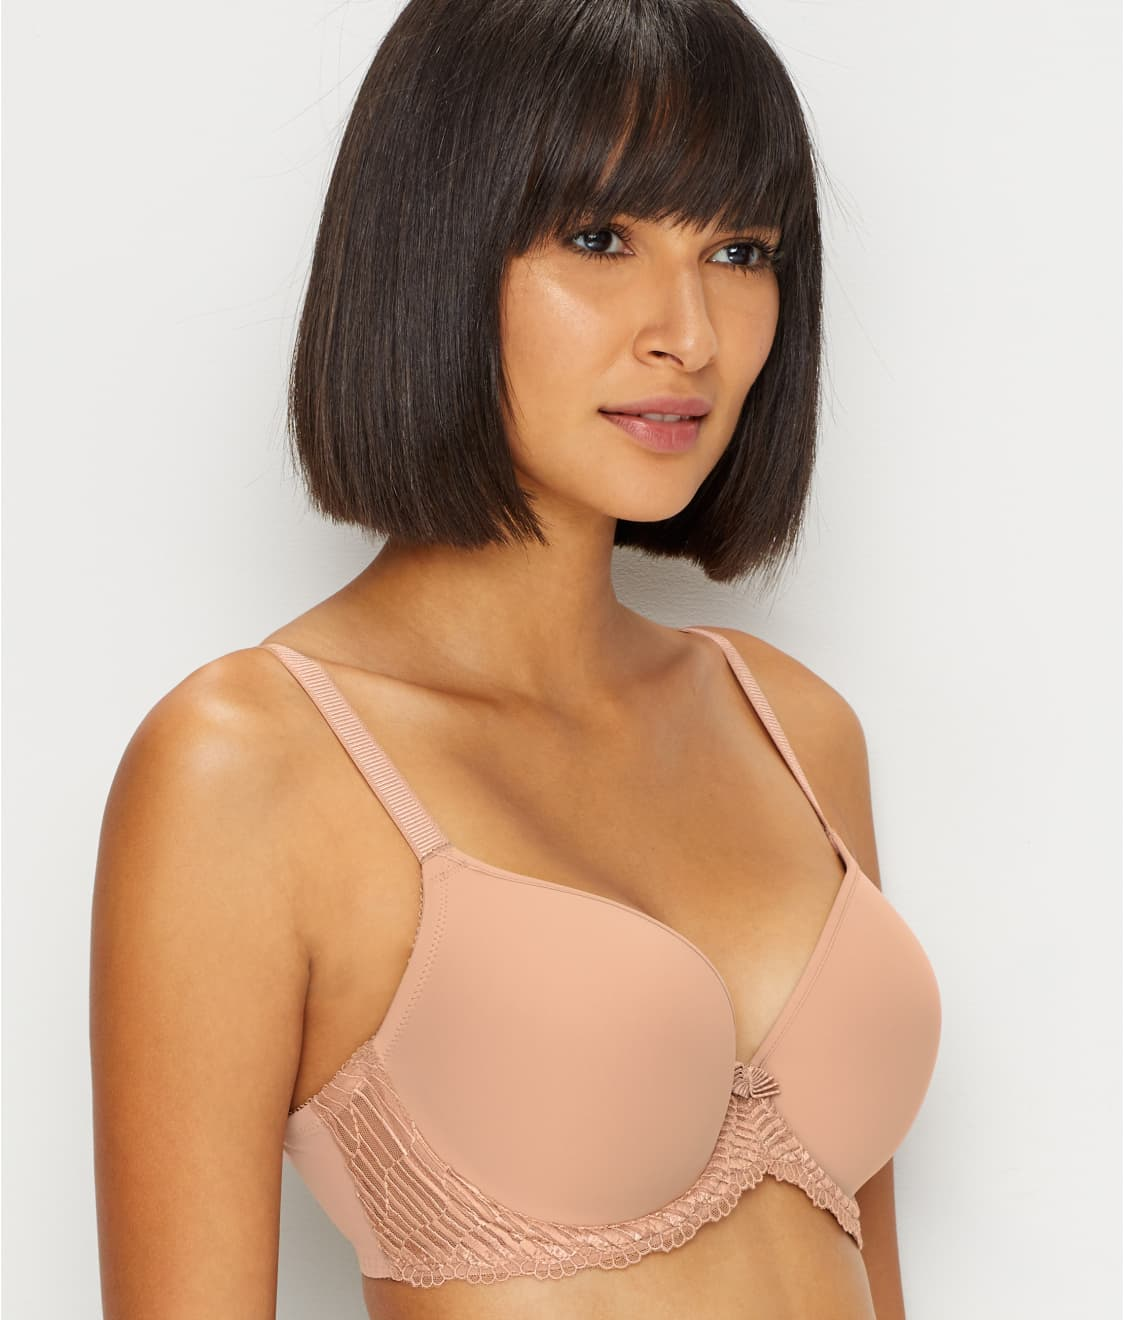 dc9e87790 See La Femme Plunge T-Shirt Bra in Rosebuck